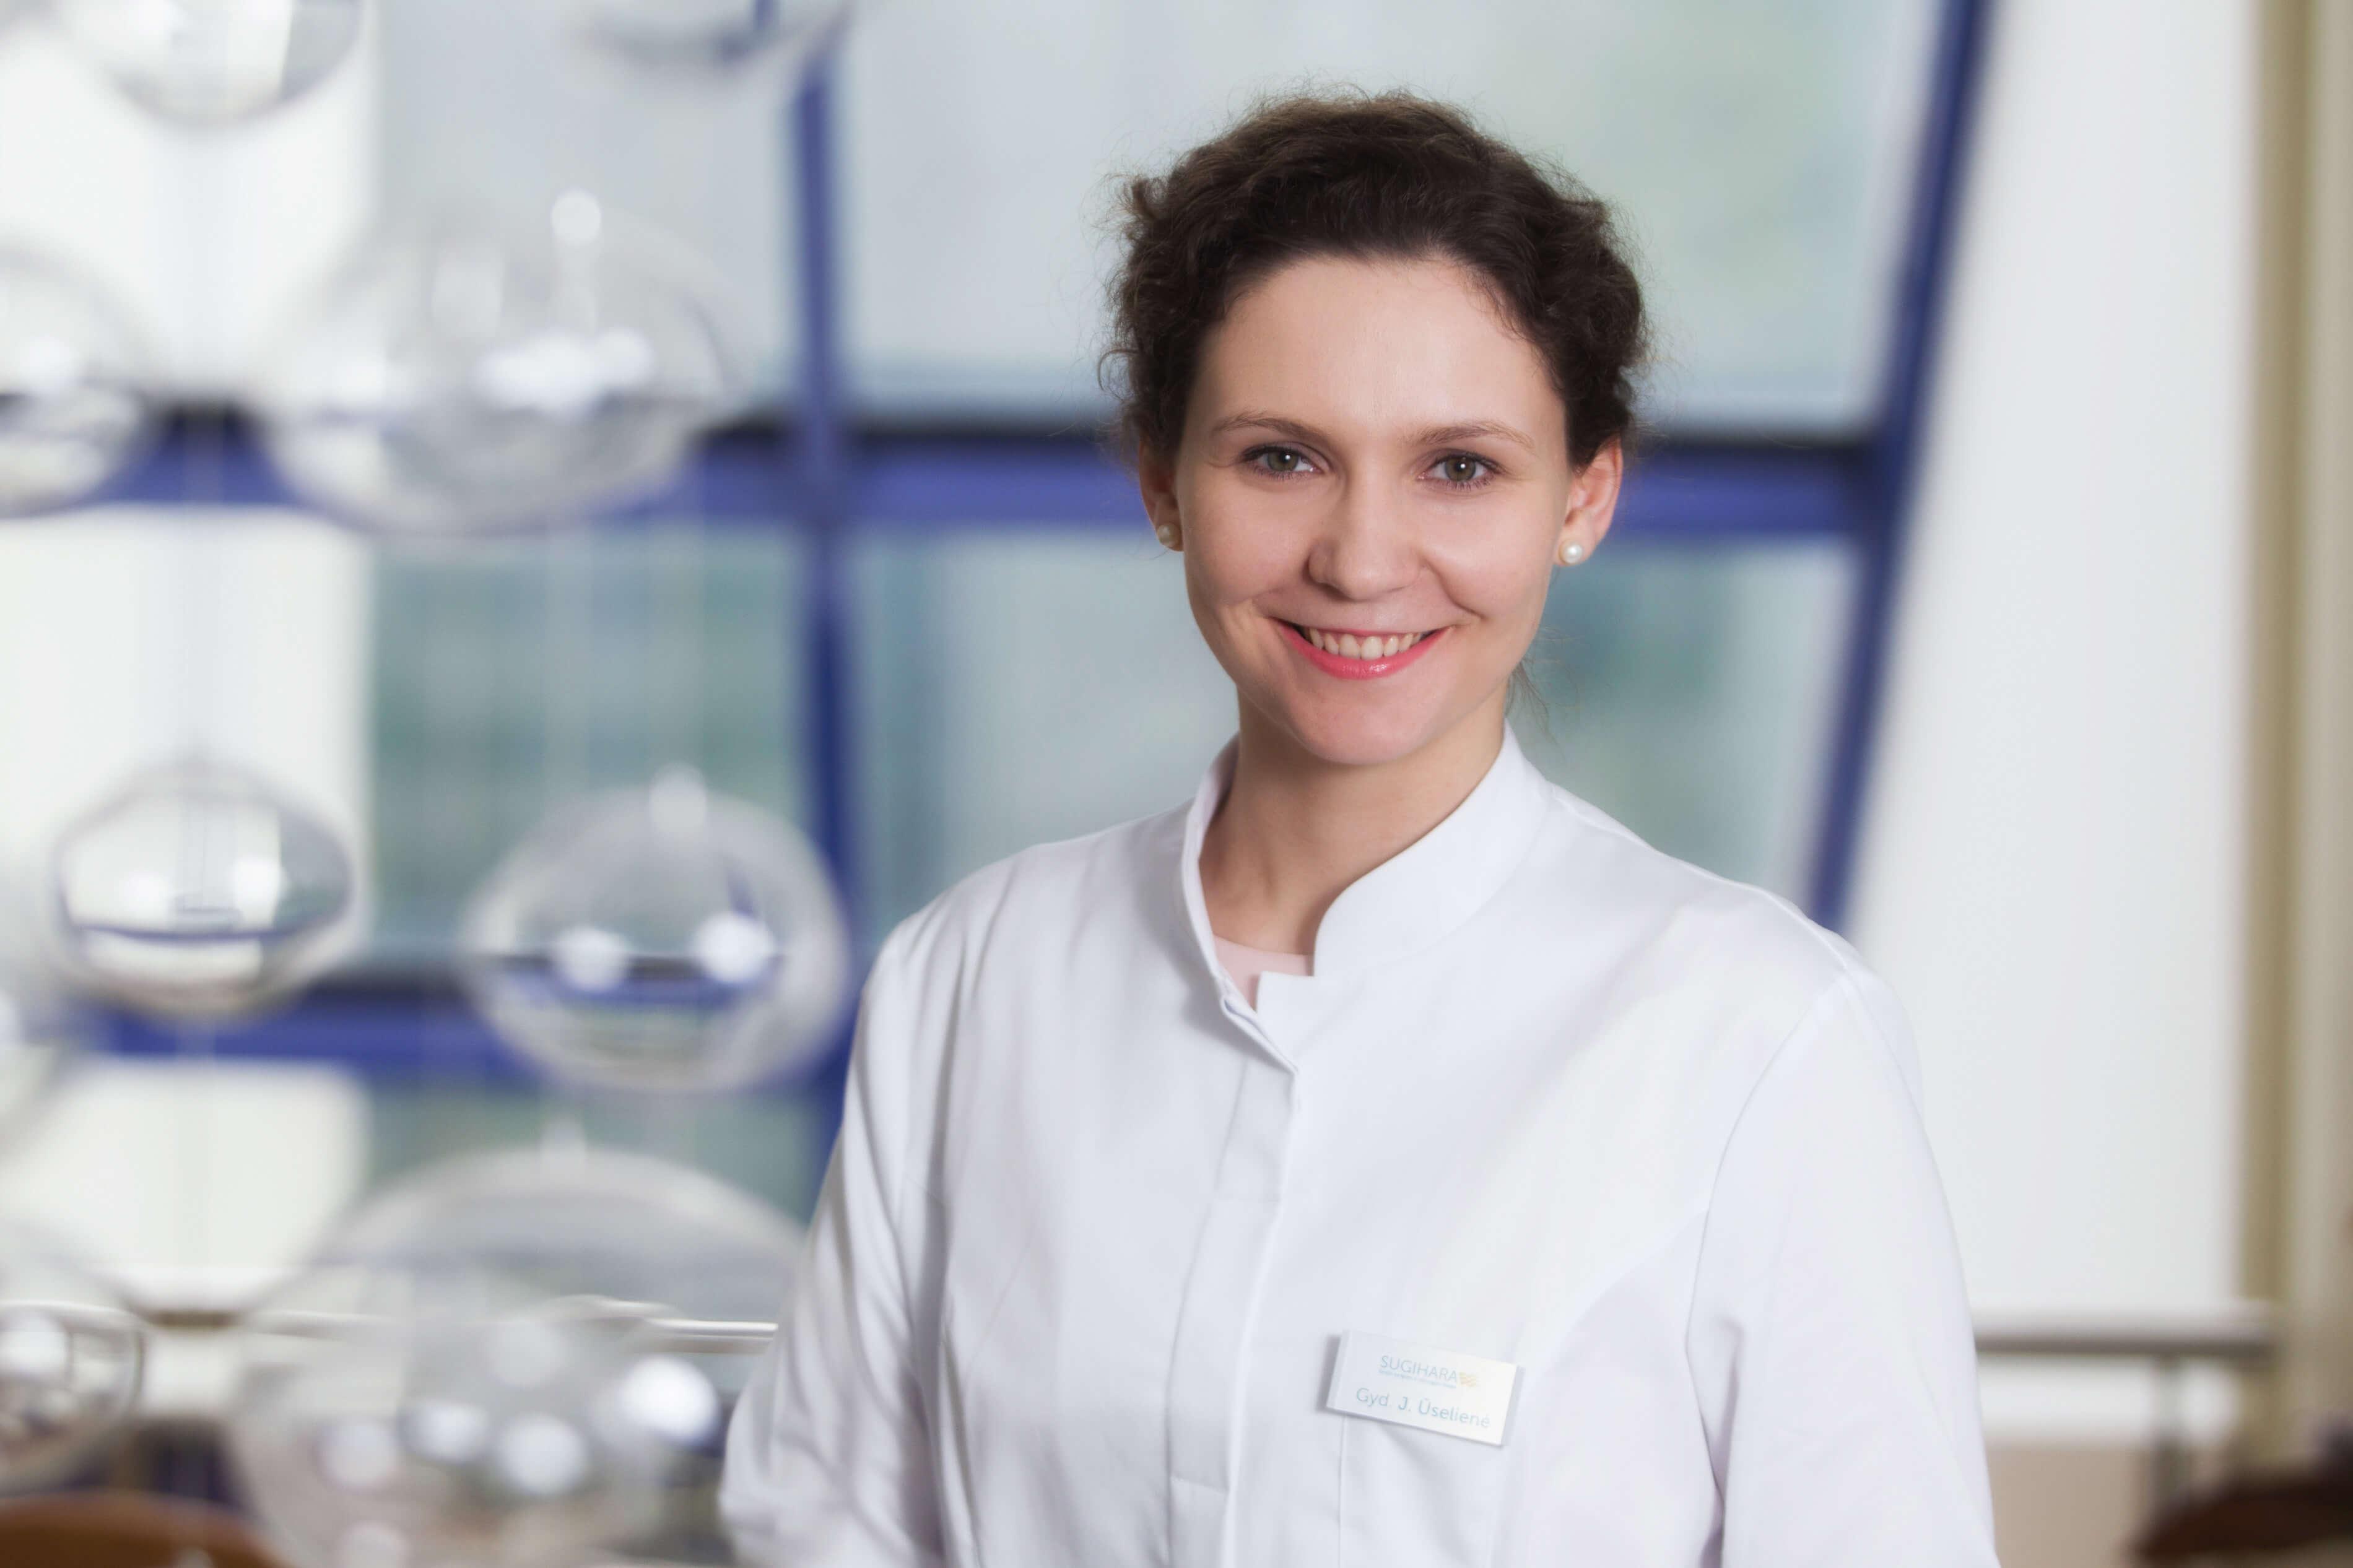 Gydytoja dermatologė Jurgina Ūselienė